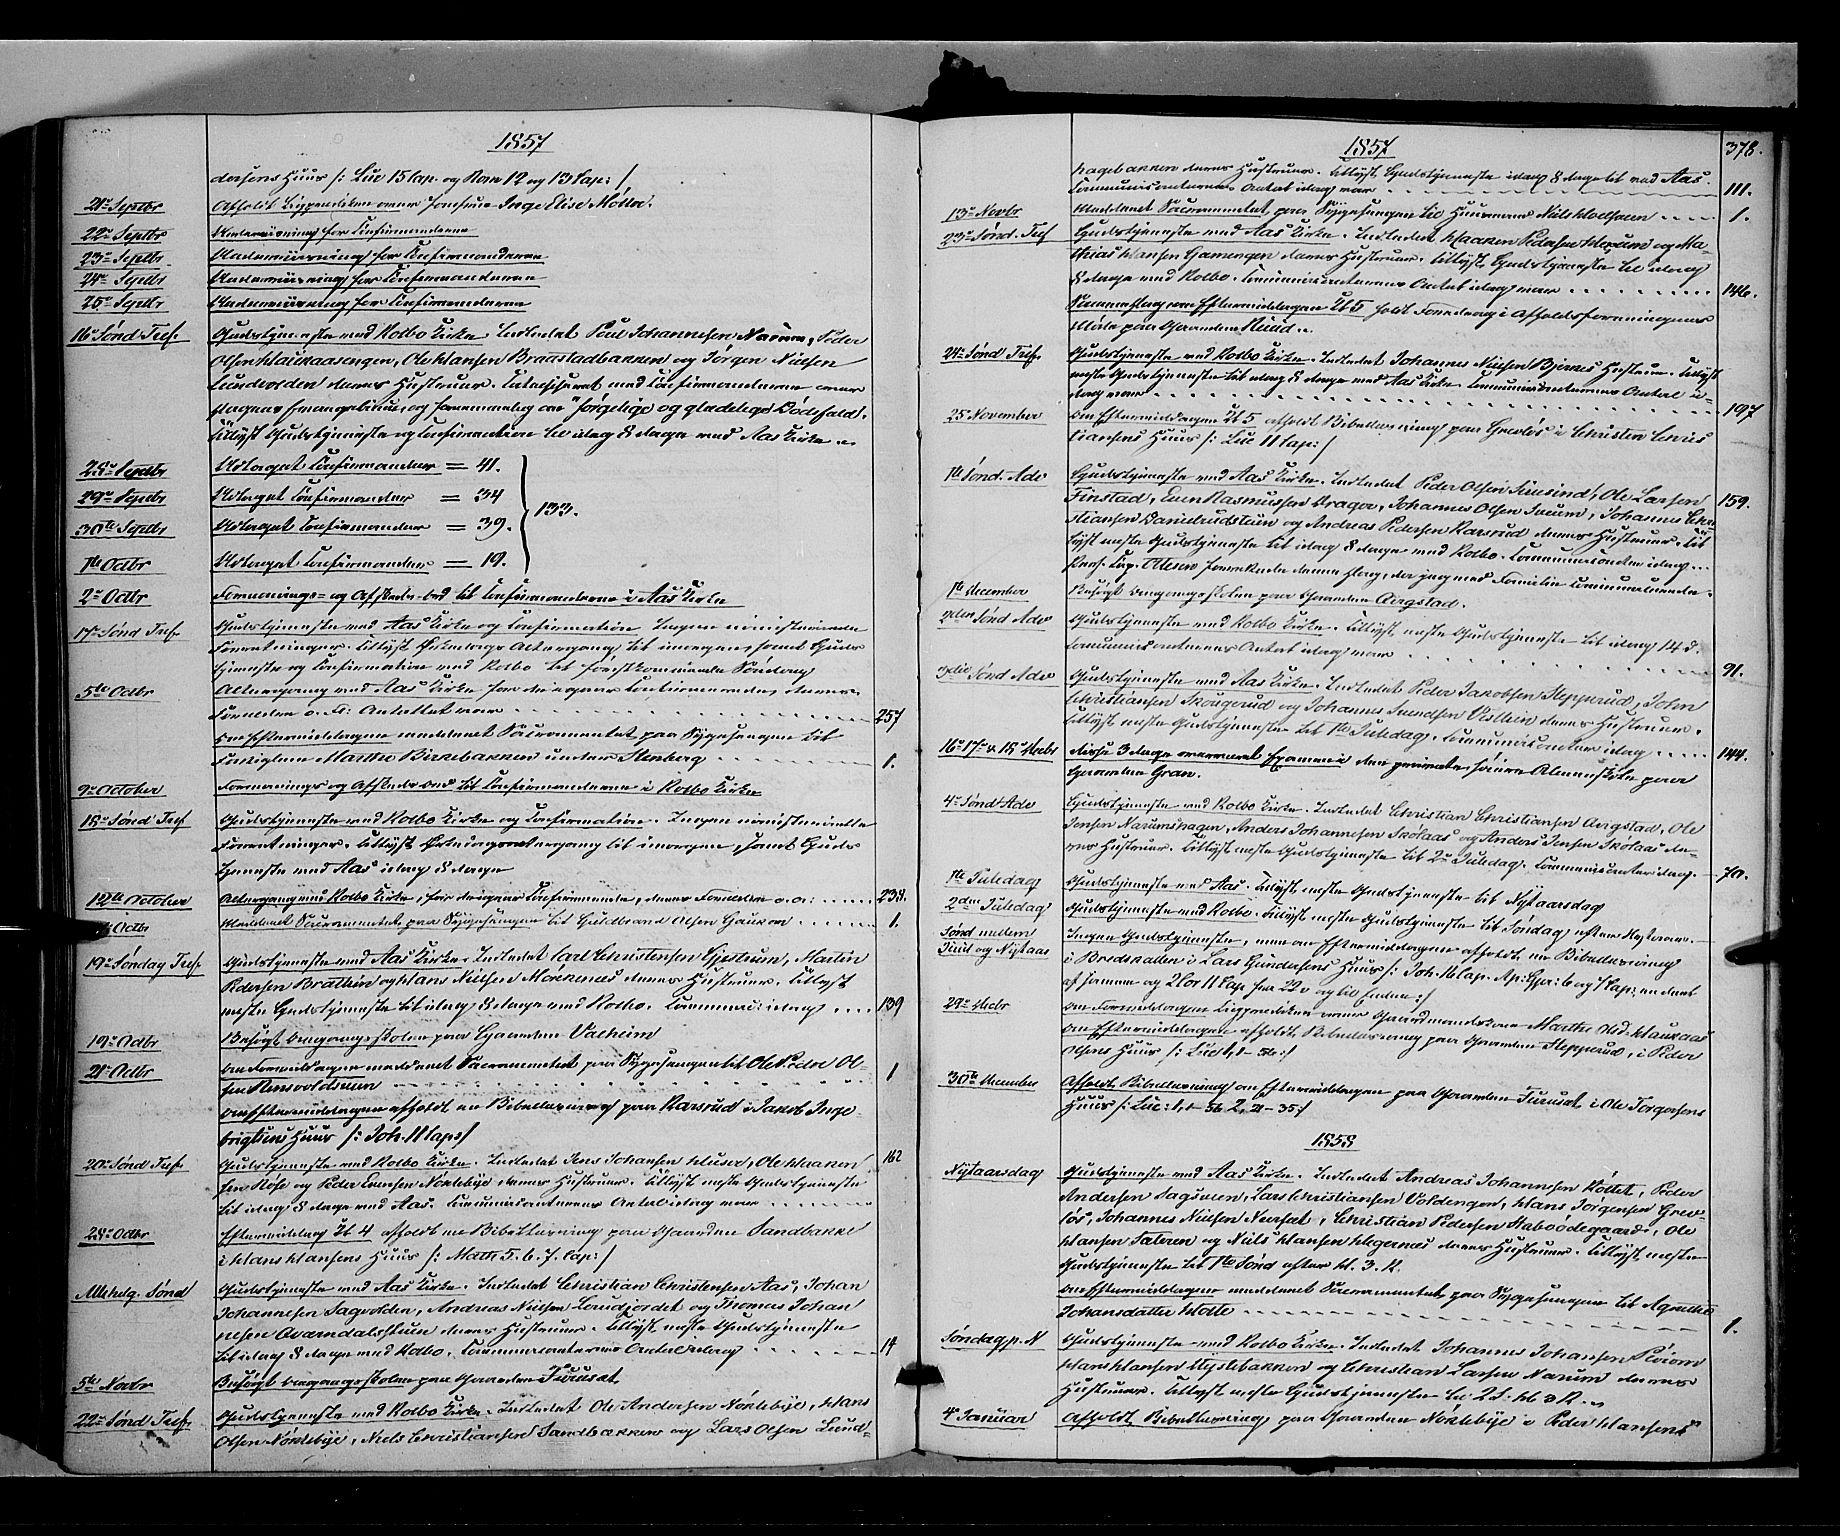 SAH, Vestre Toten prestekontor, H/Ha/Haa/L0006: Ministerialbok nr. 6, 1856-1861, s. 378